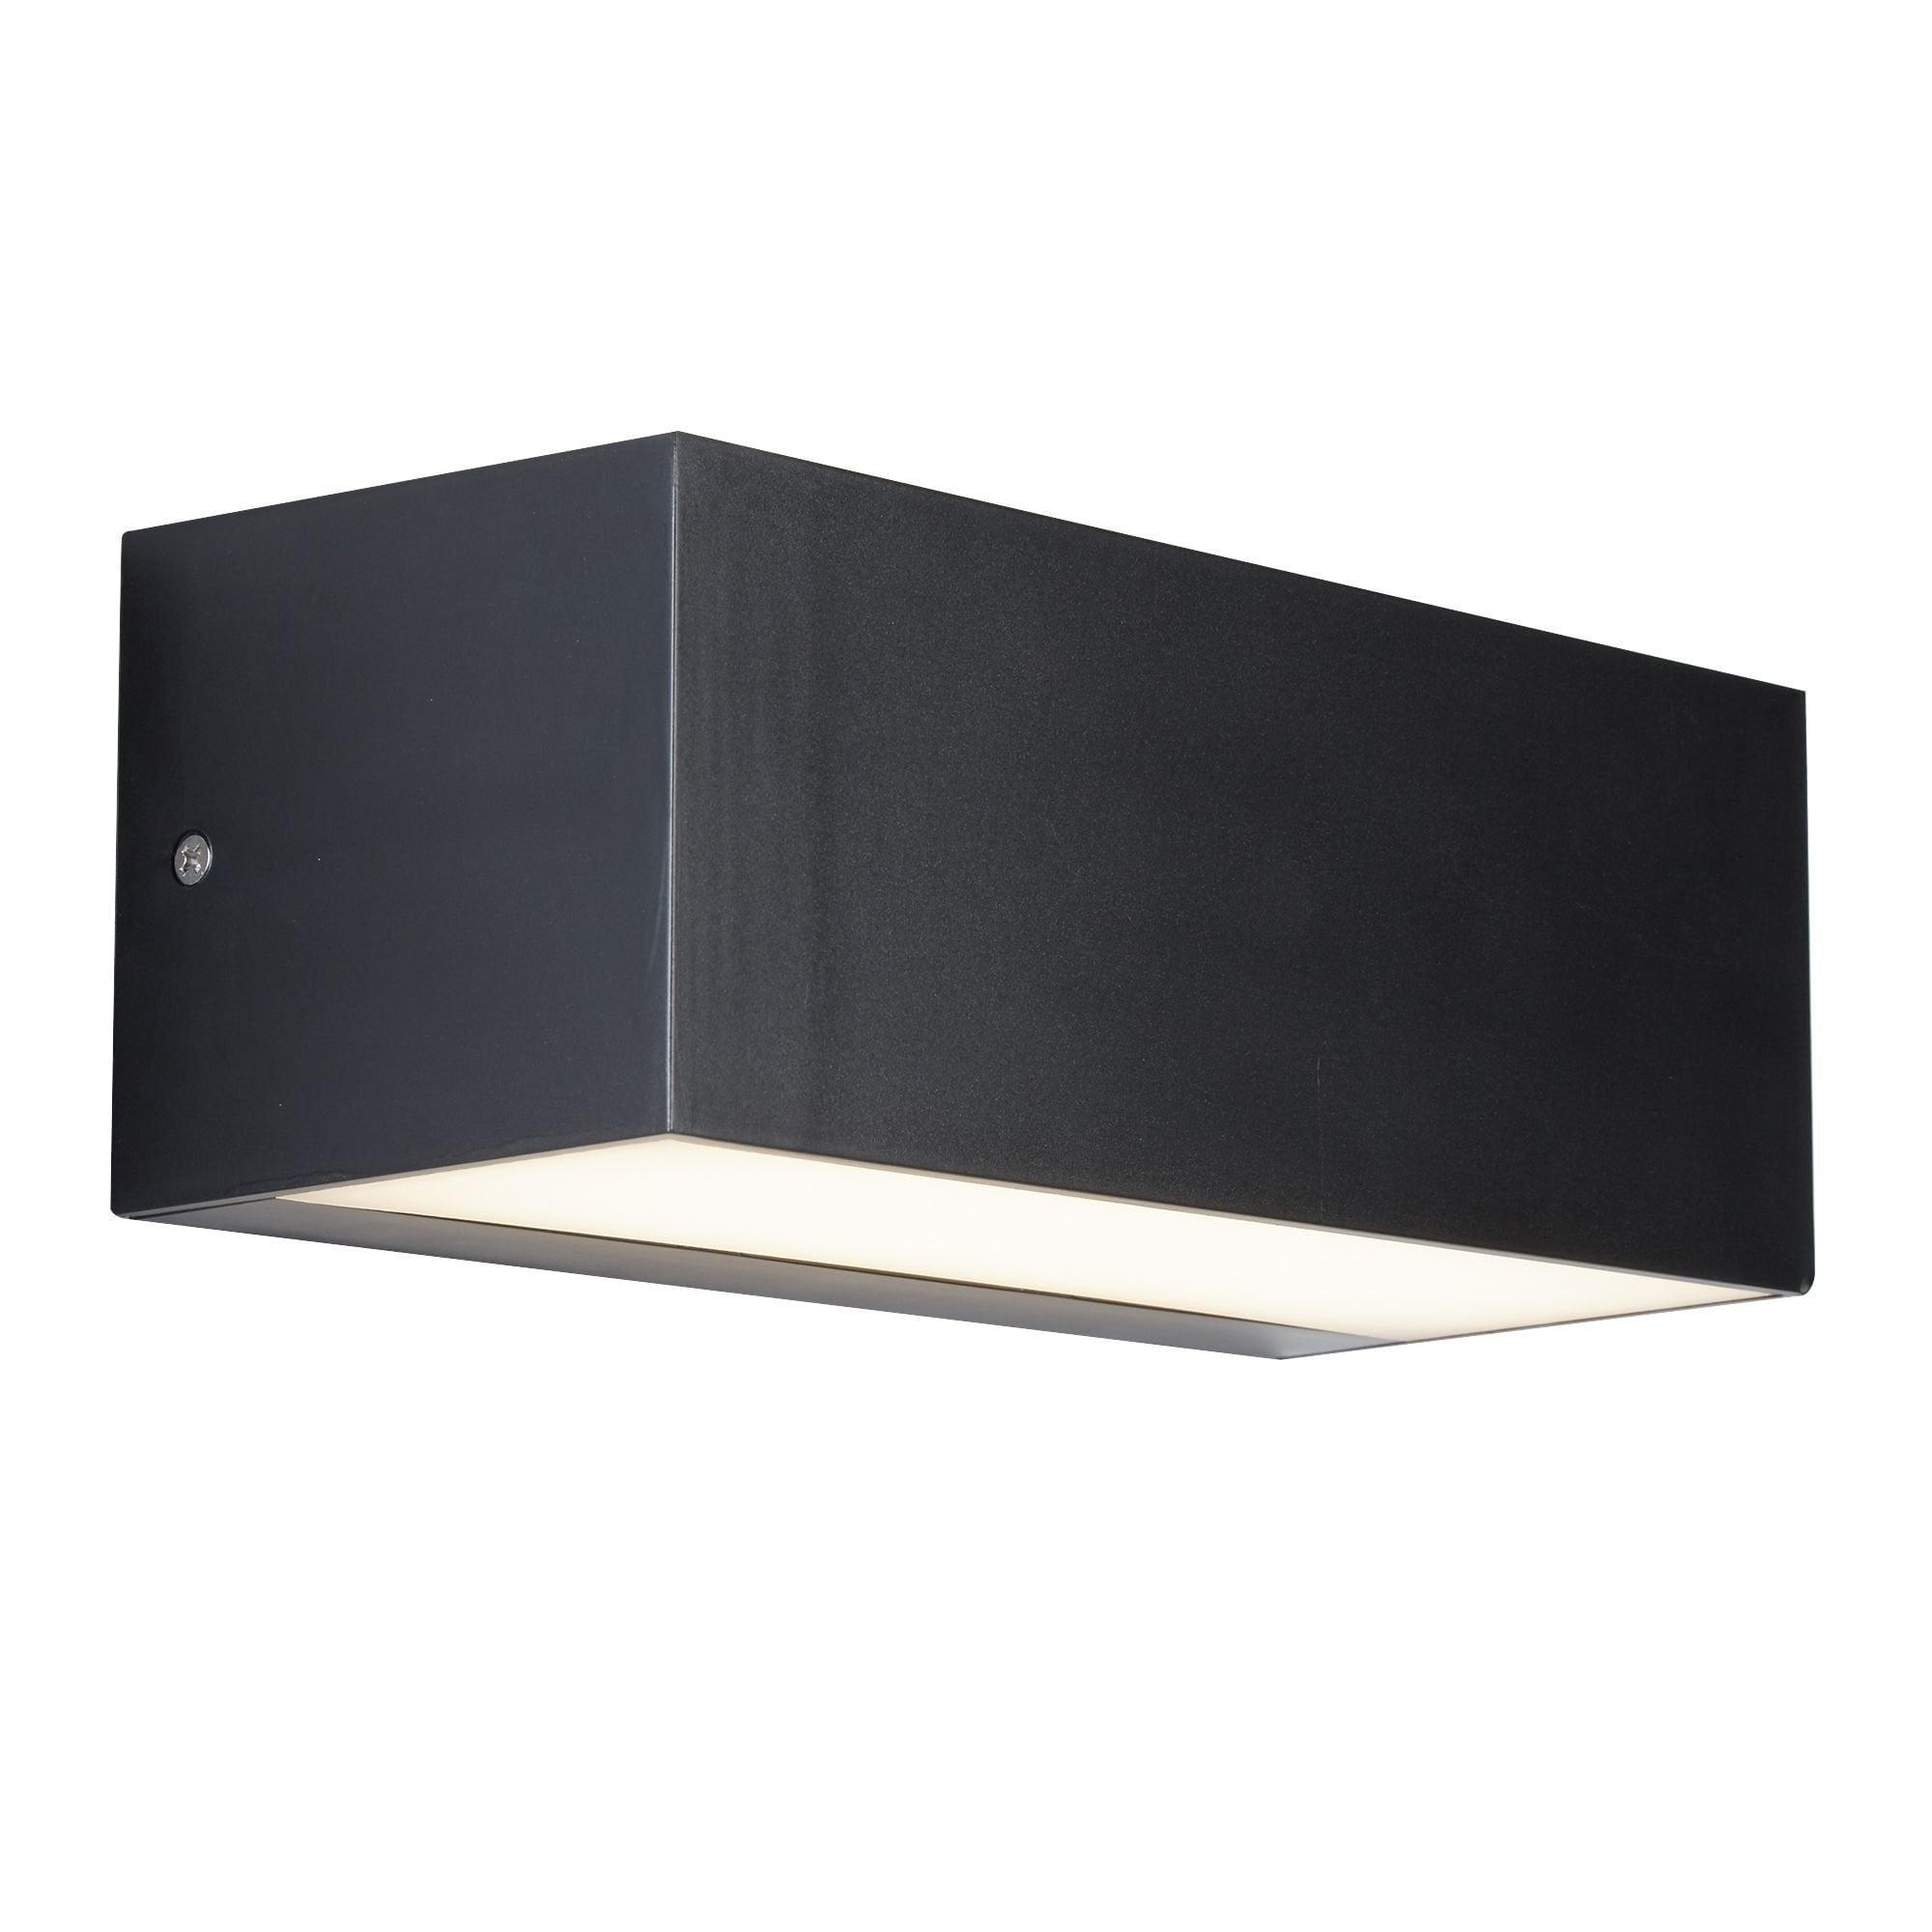 Searchlight 8735gy 14w Led Dark Grey Outdoor Wall Bracket Online Lighting Shop